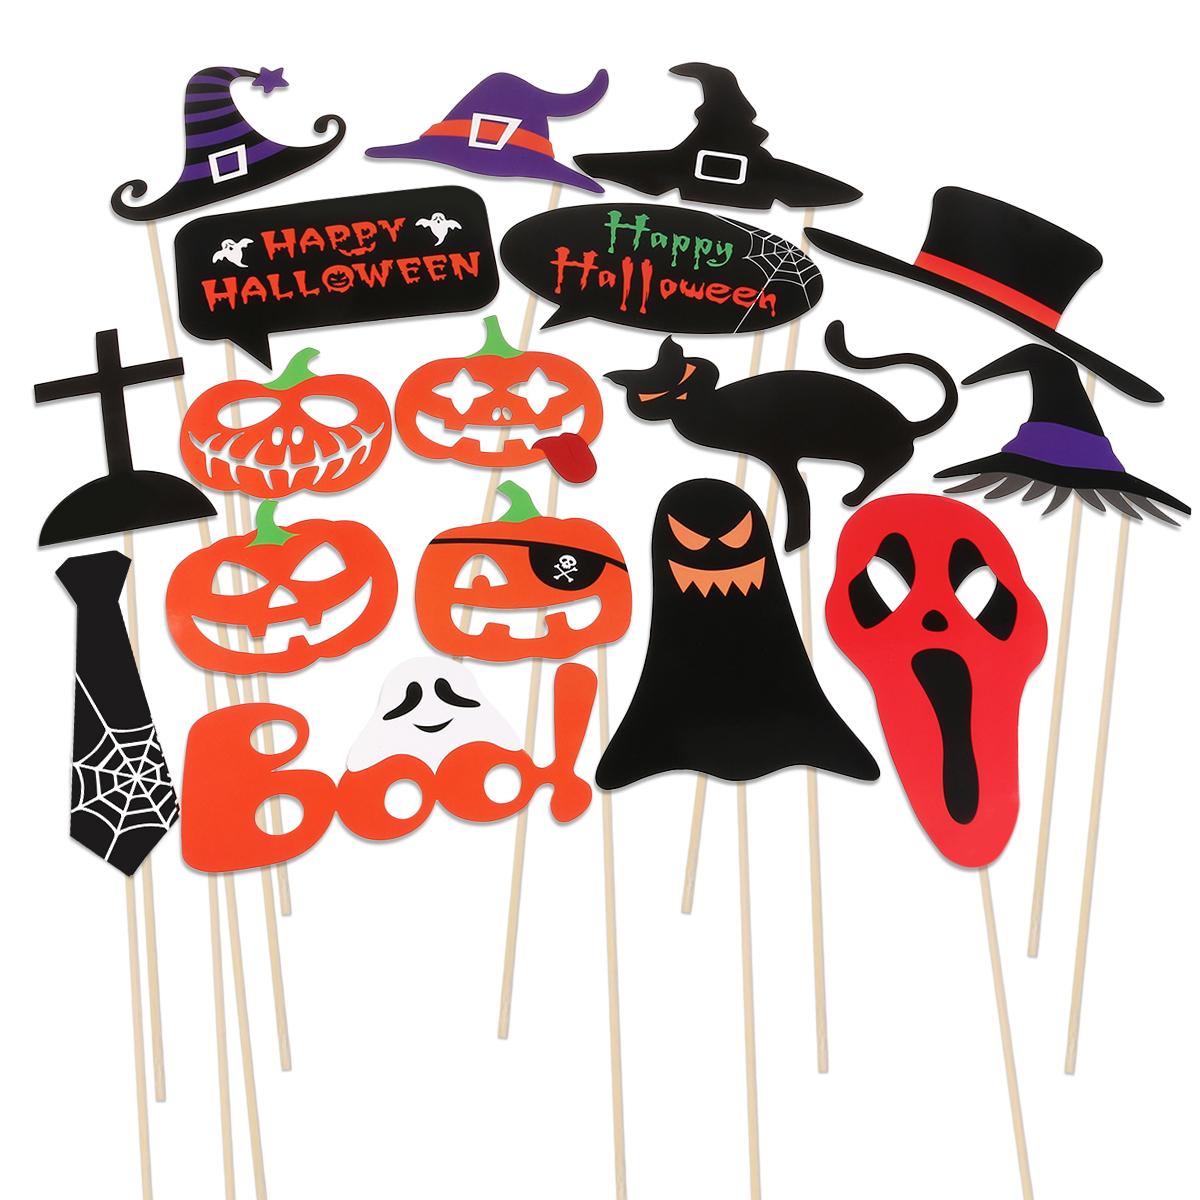 Halloween Horror Photo Props On A Stick Skull Magic Hat Pumpkin Funny Paper Beard Batman Mustache Bearded Lips Hat Masks